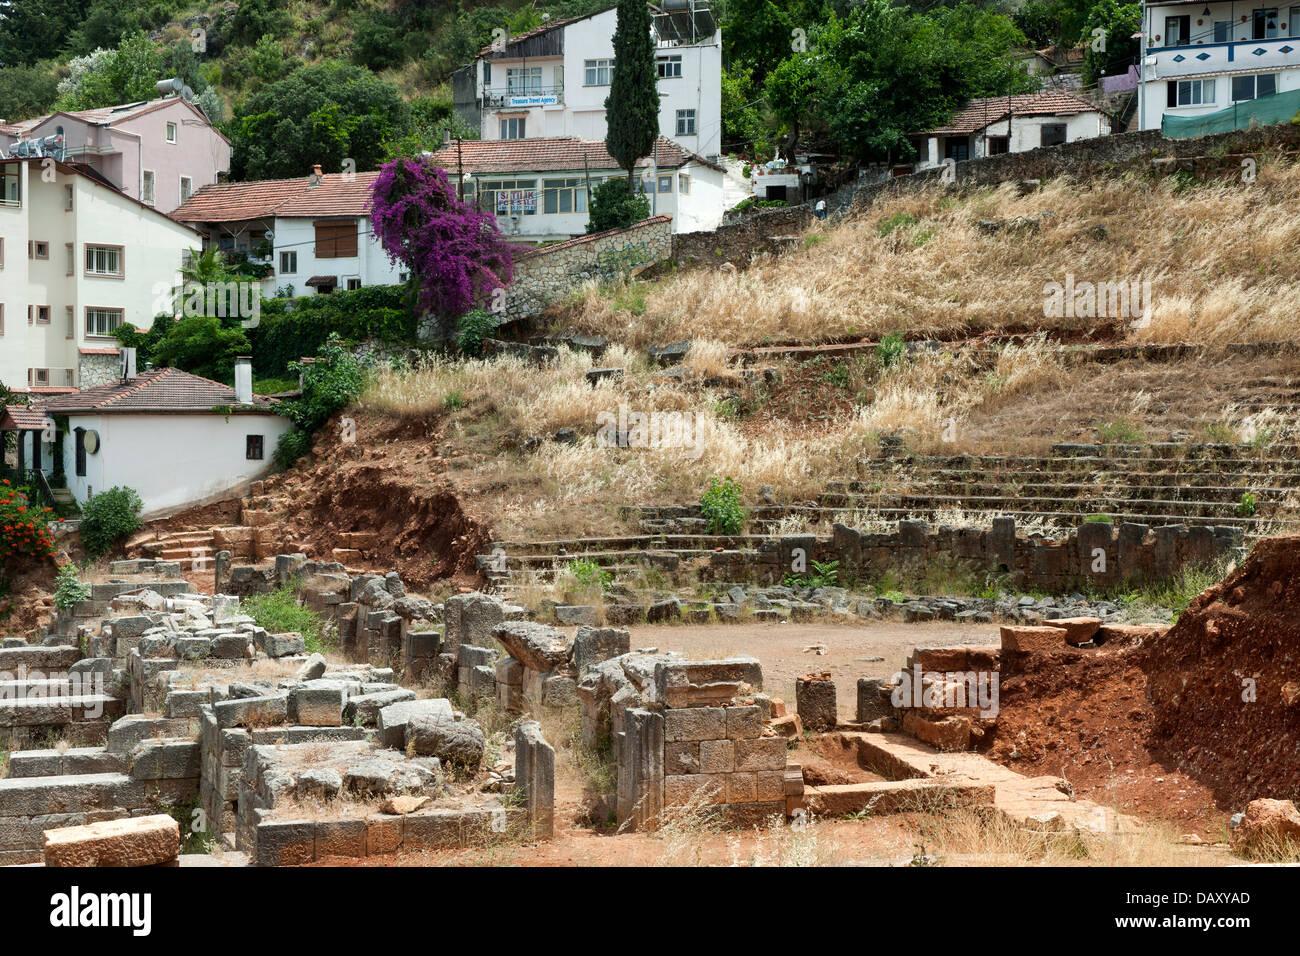 Türkei, Provinz Mugla, Fethiye, antikes Theater - Stock Image